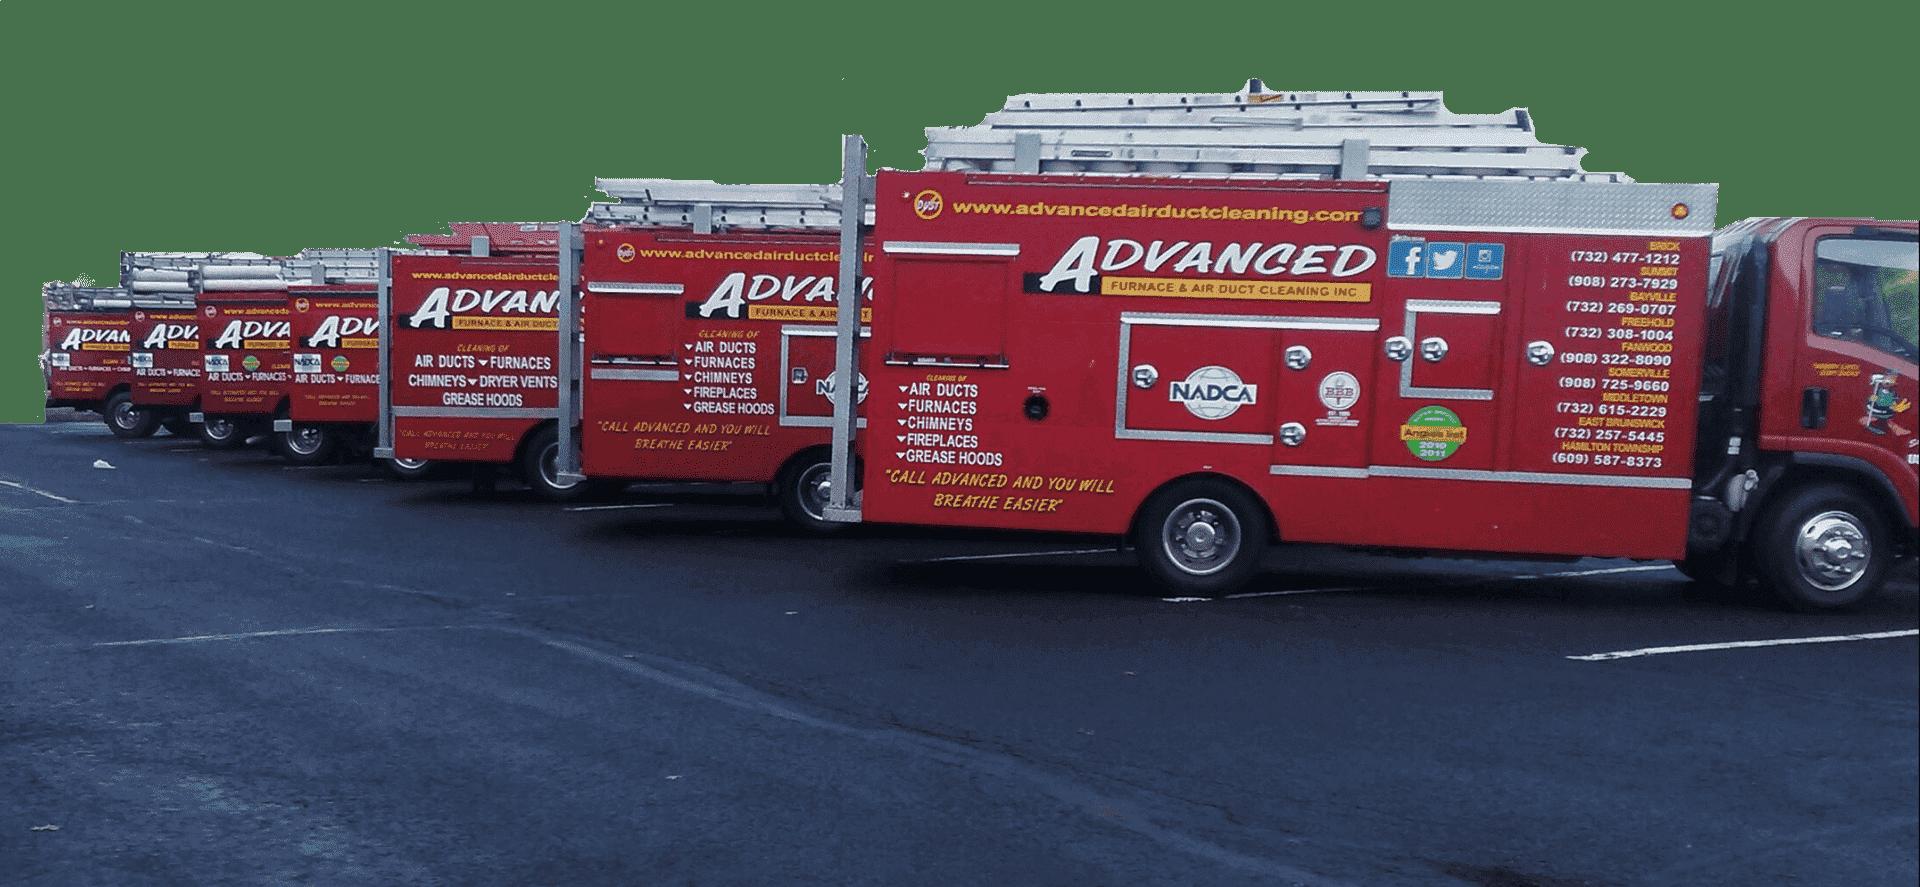 Truckspic4 Advanced Furnace Air Duct Cleaning Nj